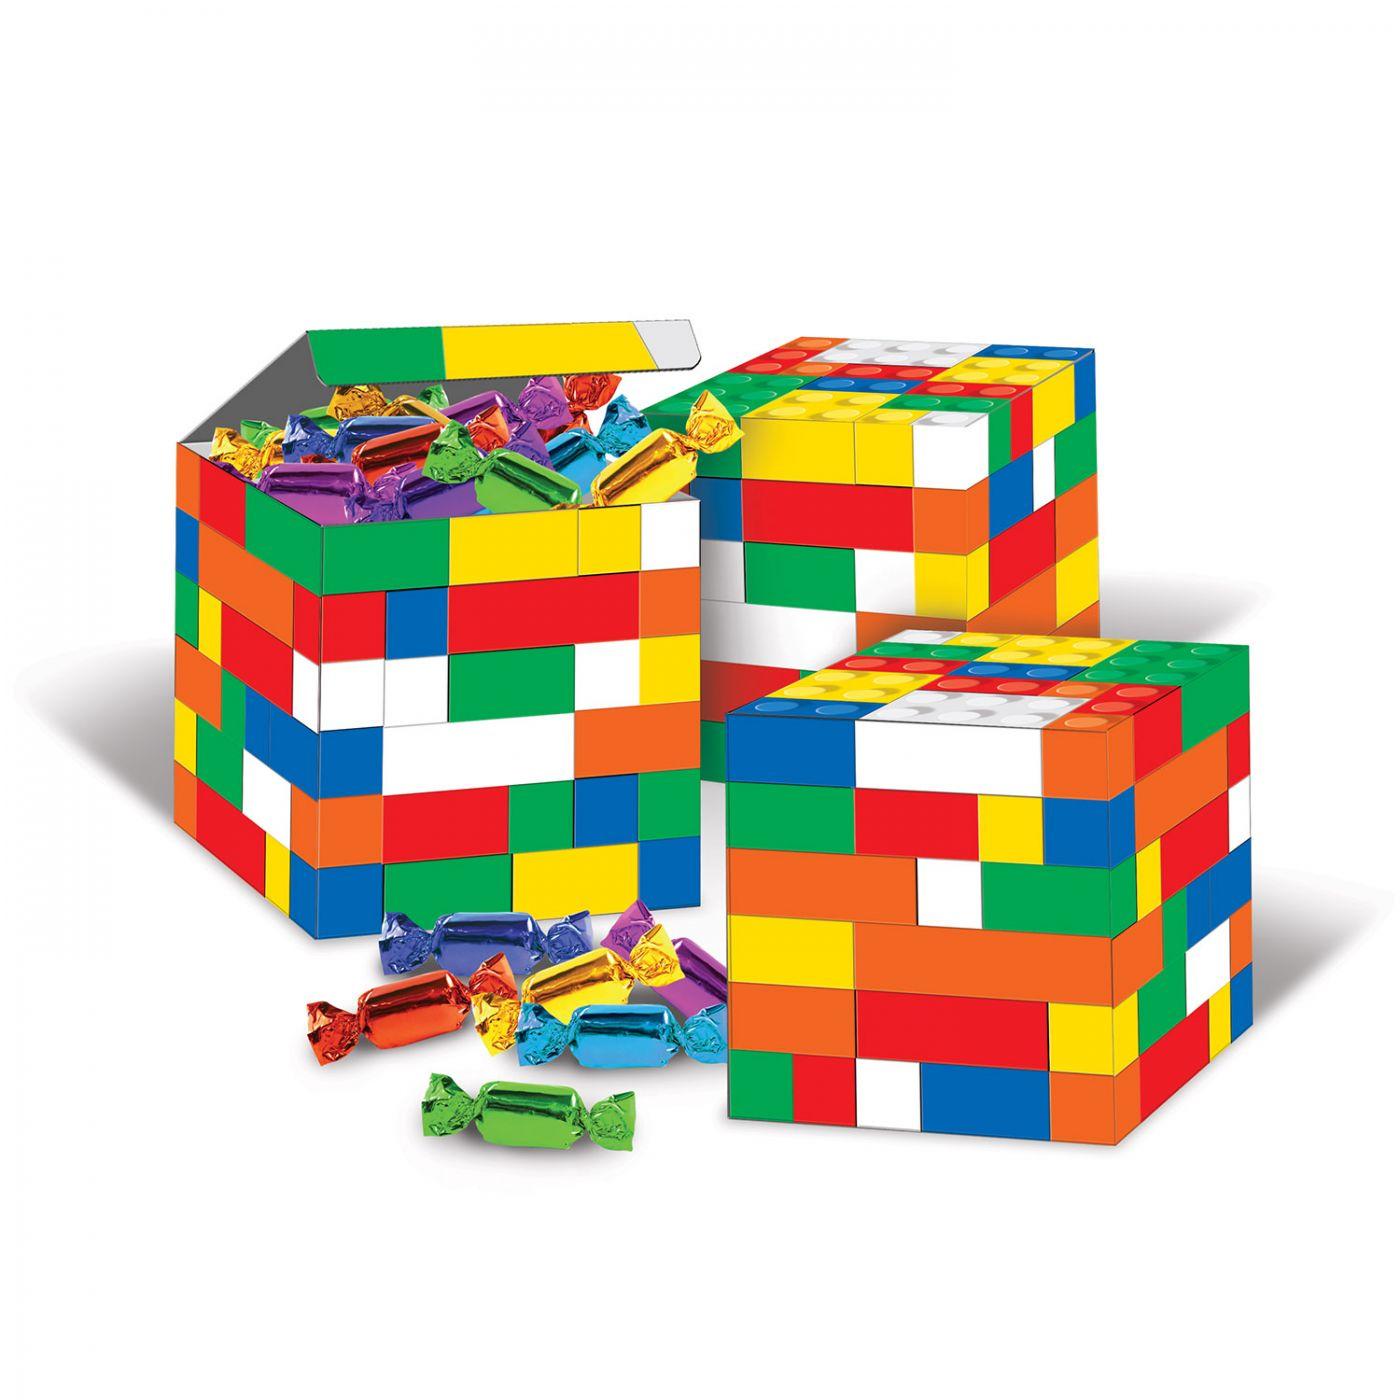 Image of Building Blocks Favor Boxes